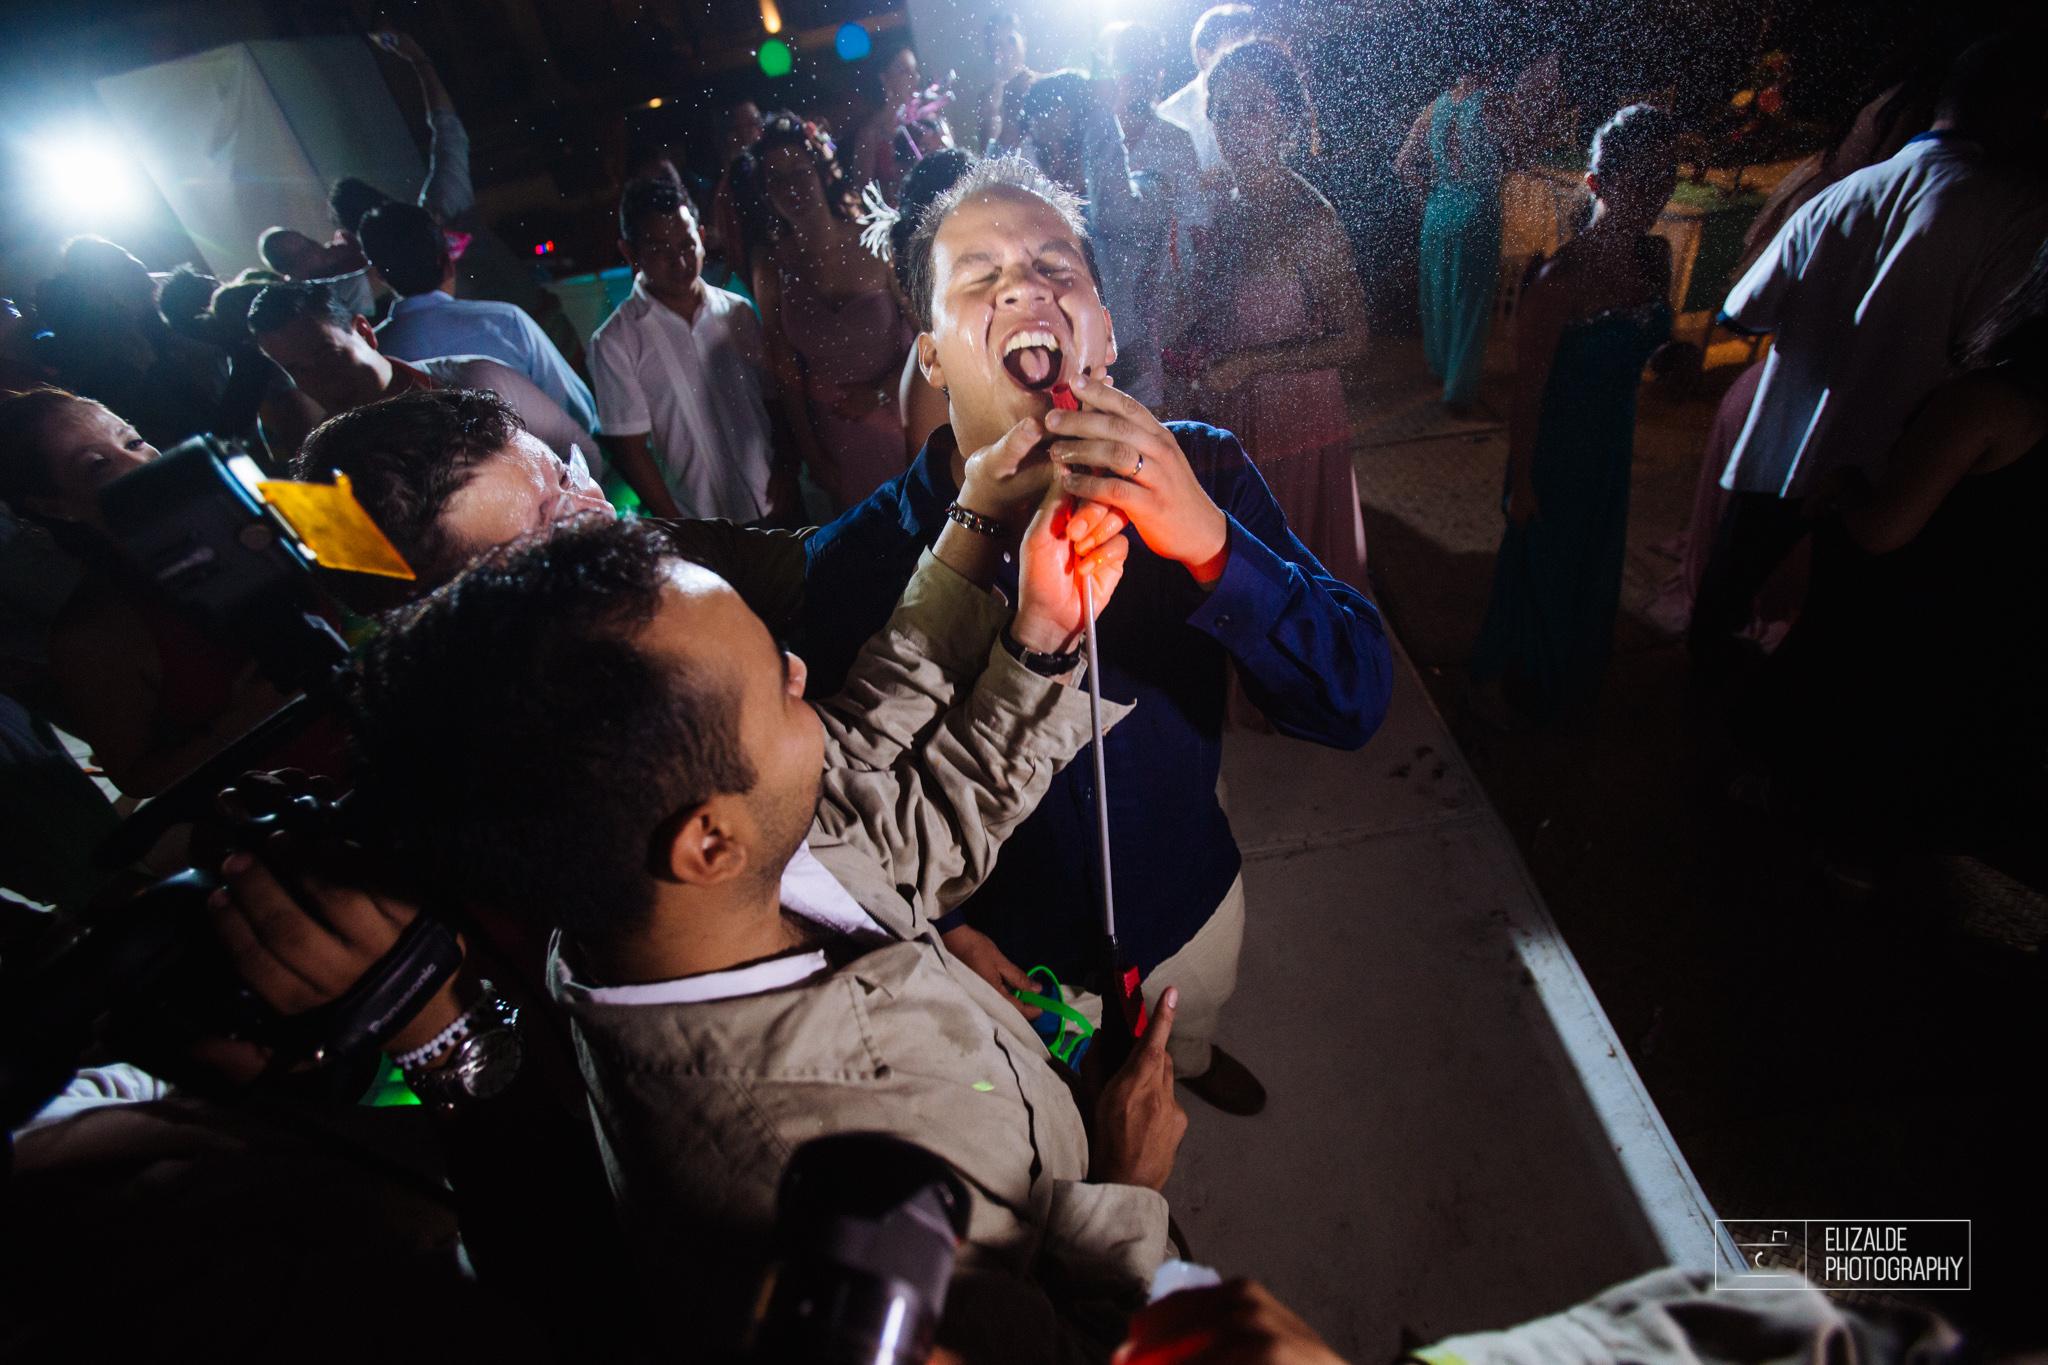 Pay and Ferran_Acapulco_Destination Wedding_Elizalde Photography-139.jpg